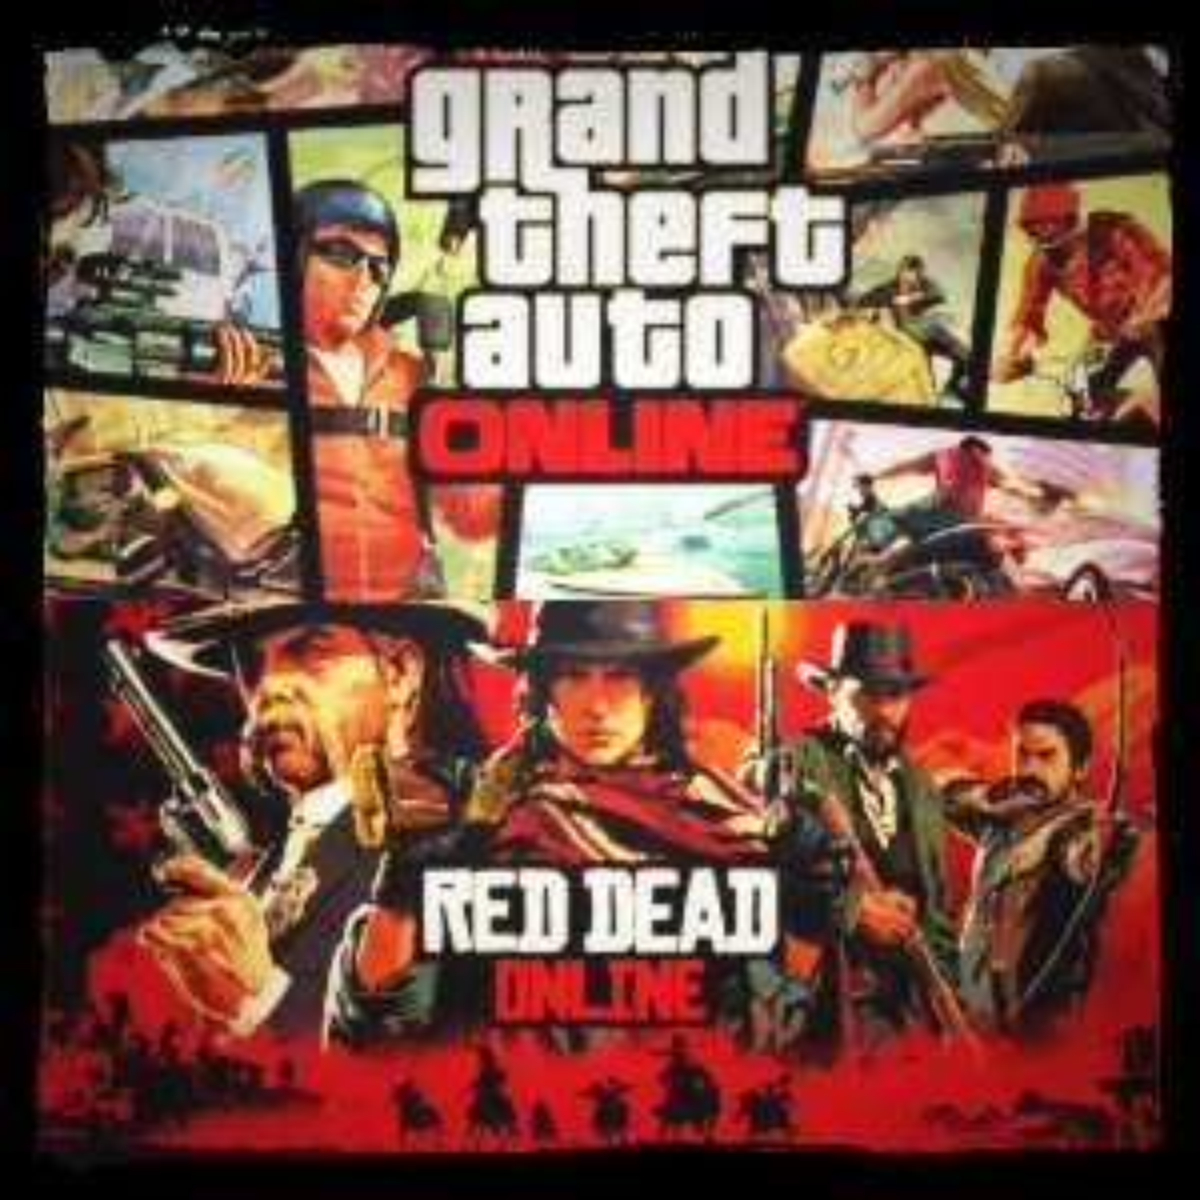 Darmowe bonusy za grę w GTA Online i Red Dead Online